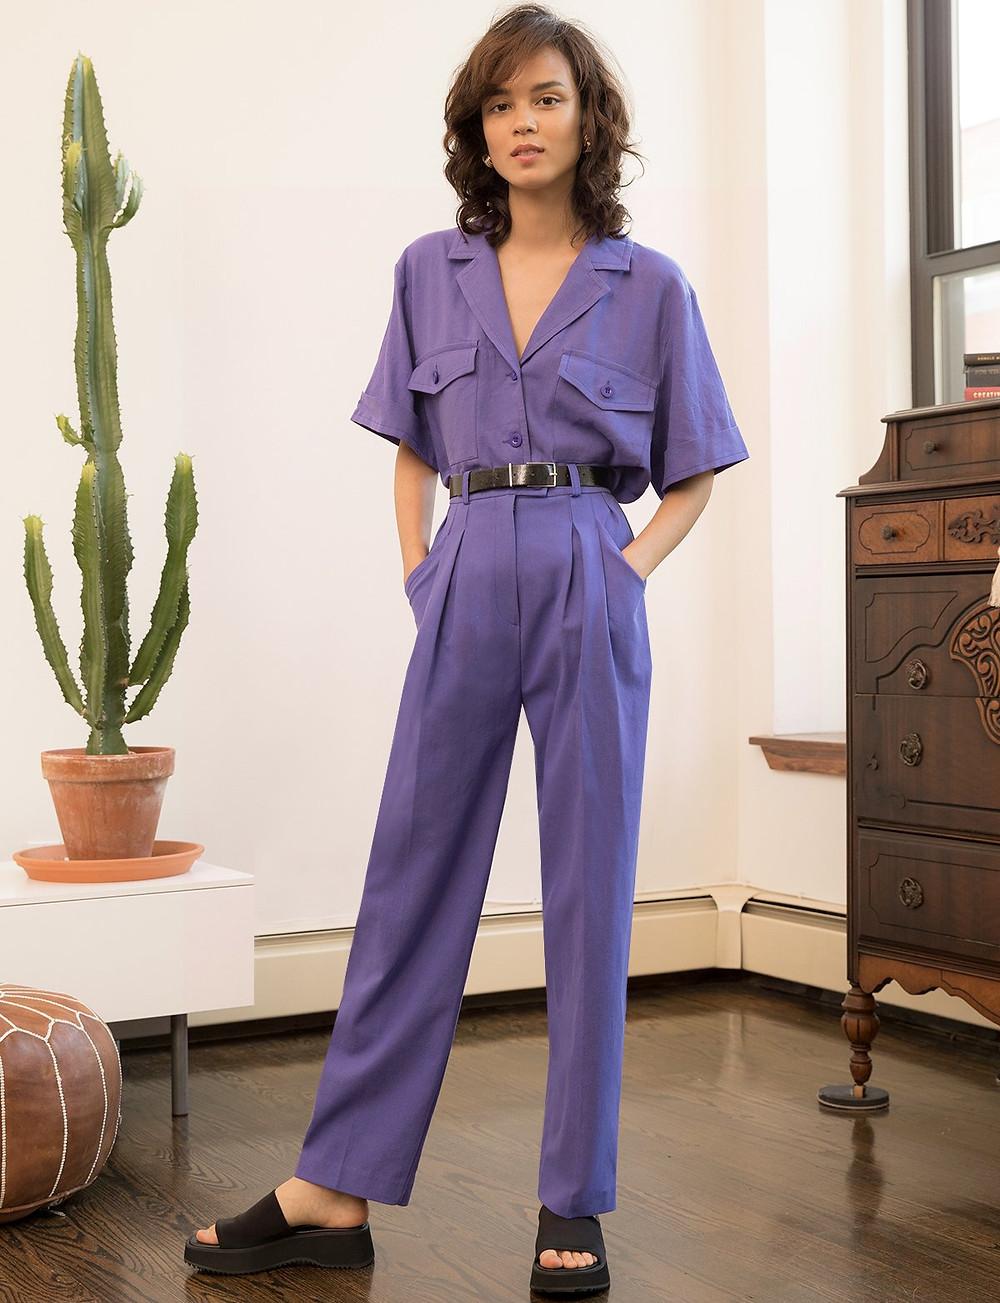 Pixie Market Purple Utility Shirt $95